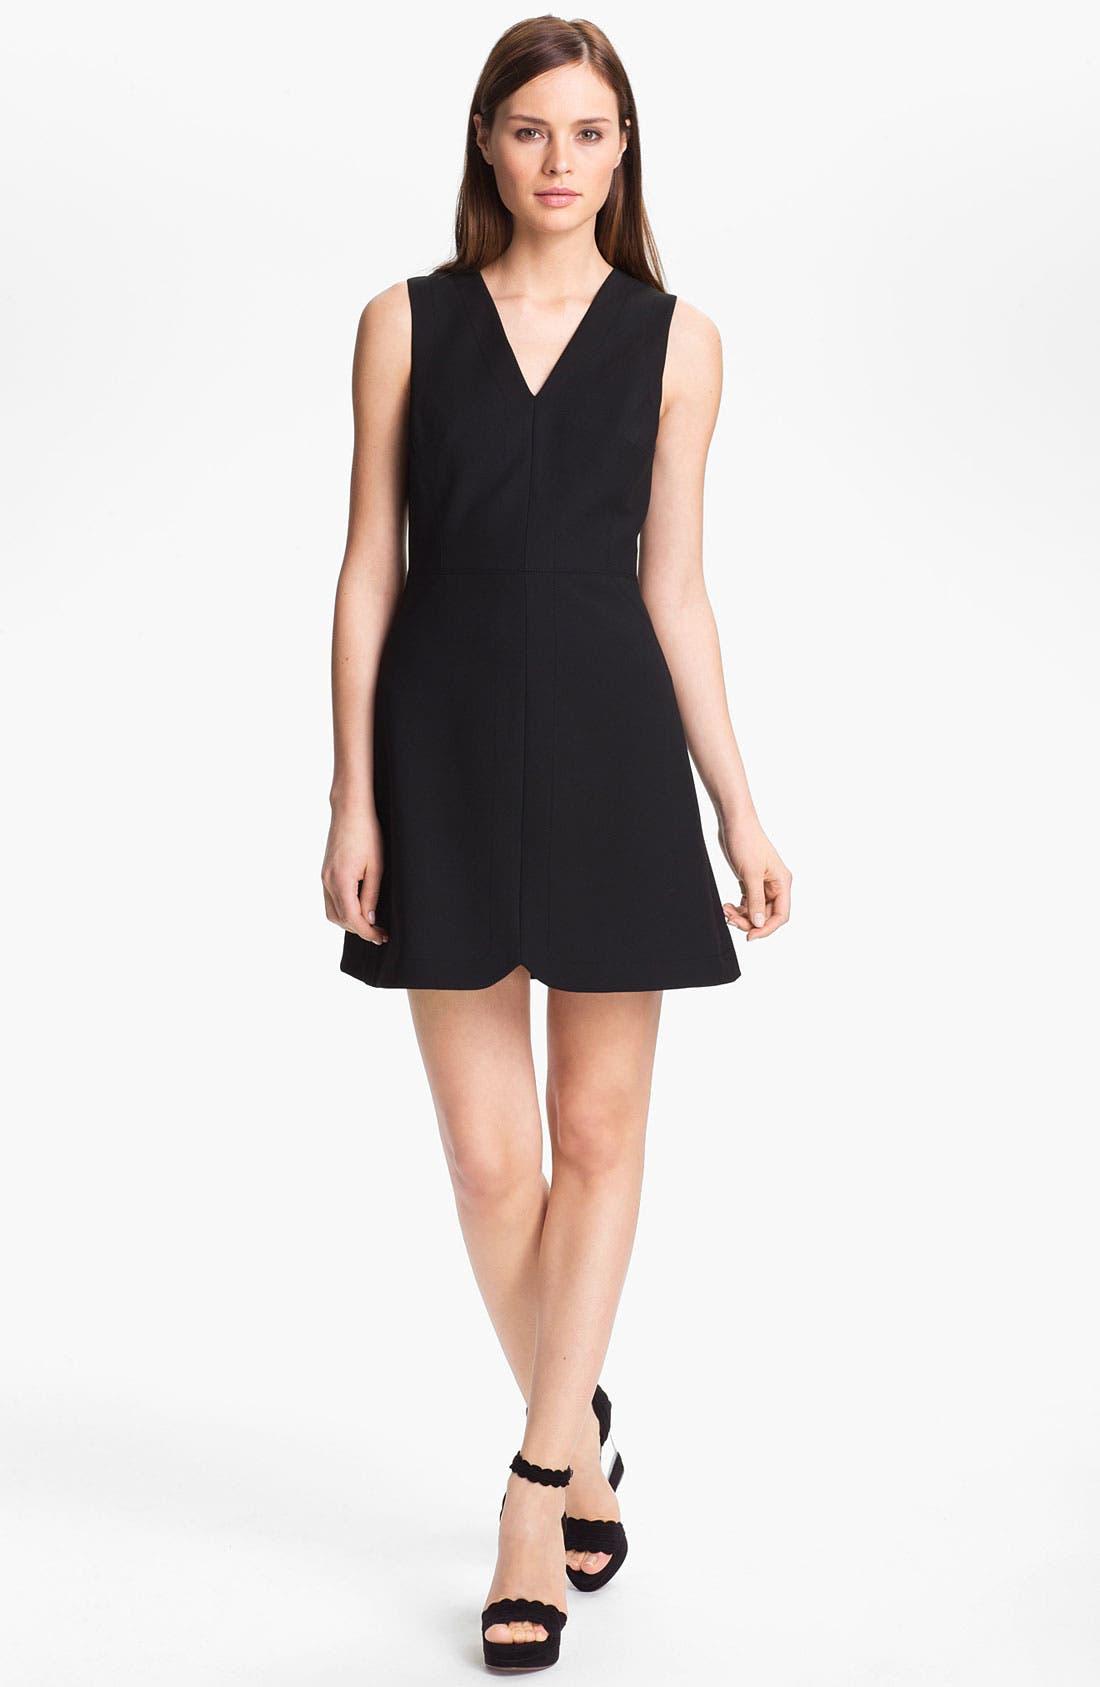 Alternate Image 1 Selected - Tibi Sleeveless Stretch Knit Dress